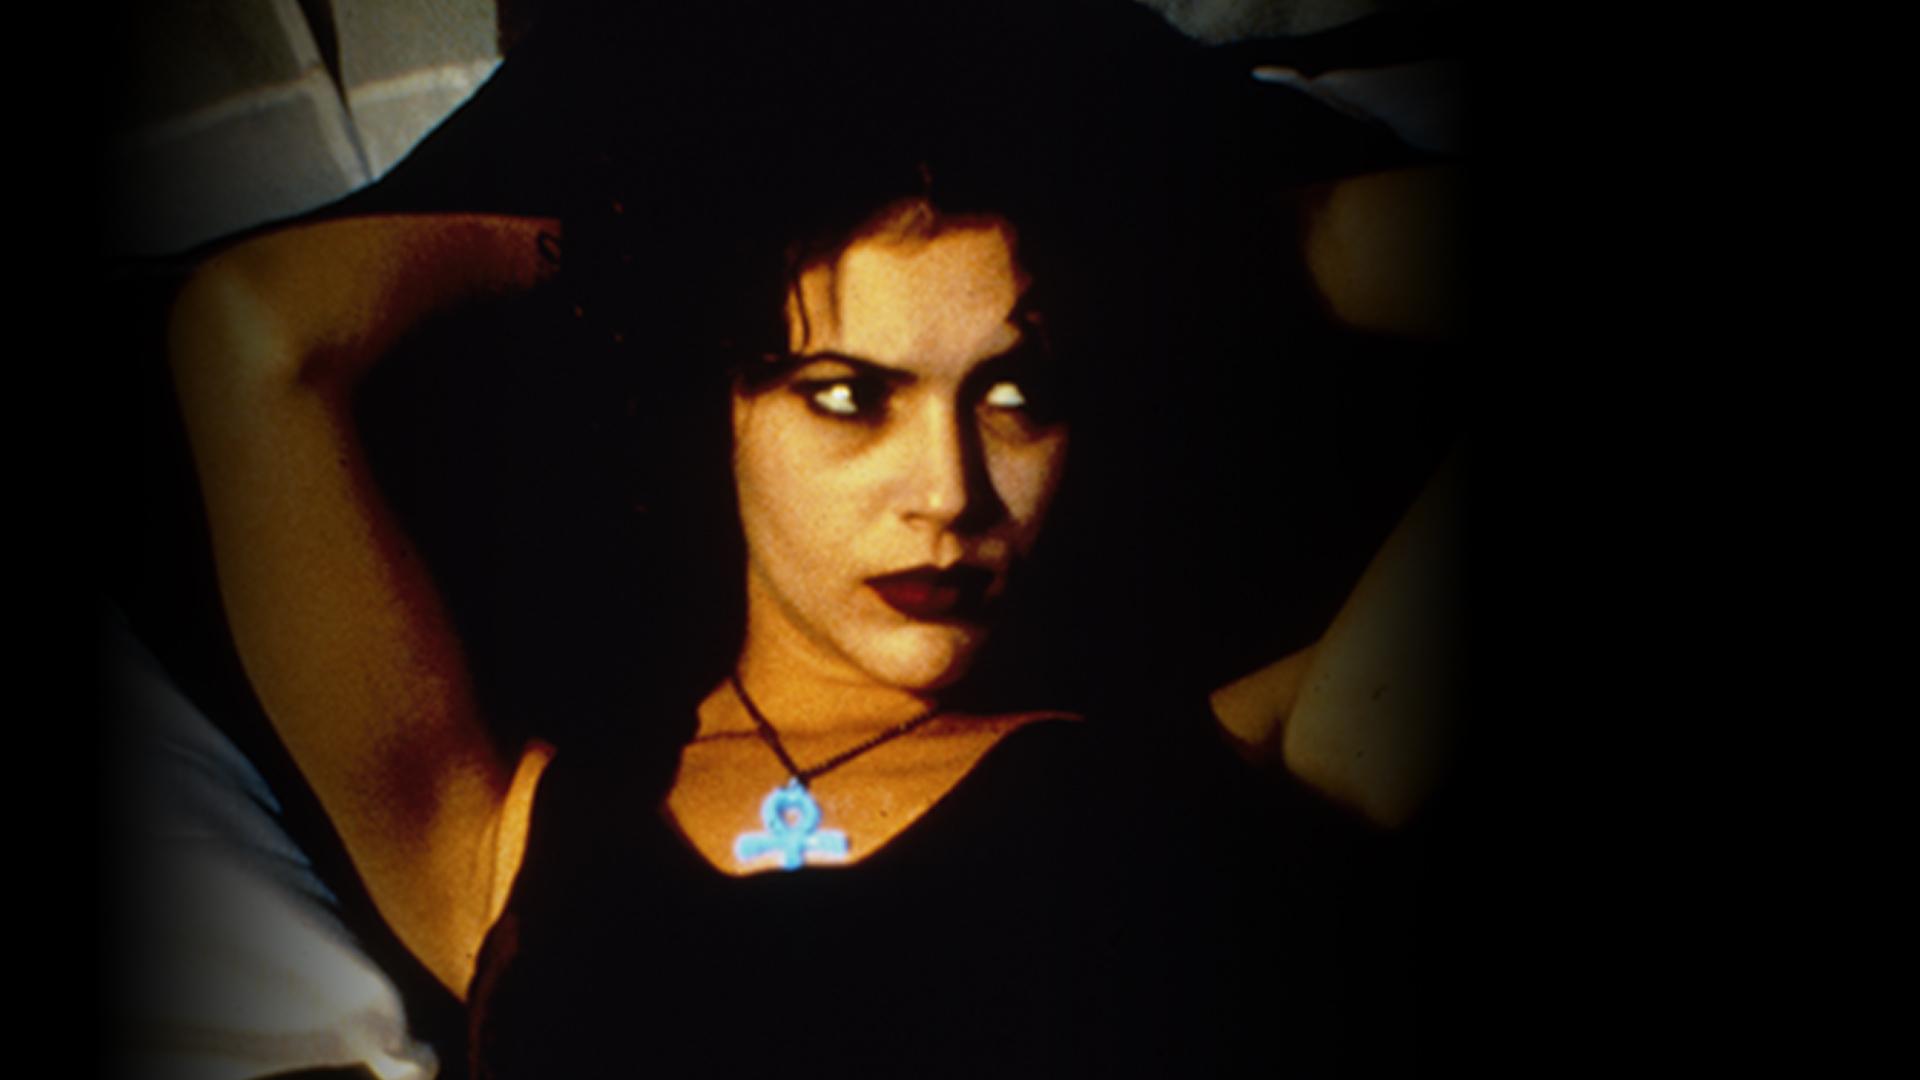 Alyssa Milano Embrace Of The Vampire embrace of the vampire 1995 · appid: 664930 · steam database